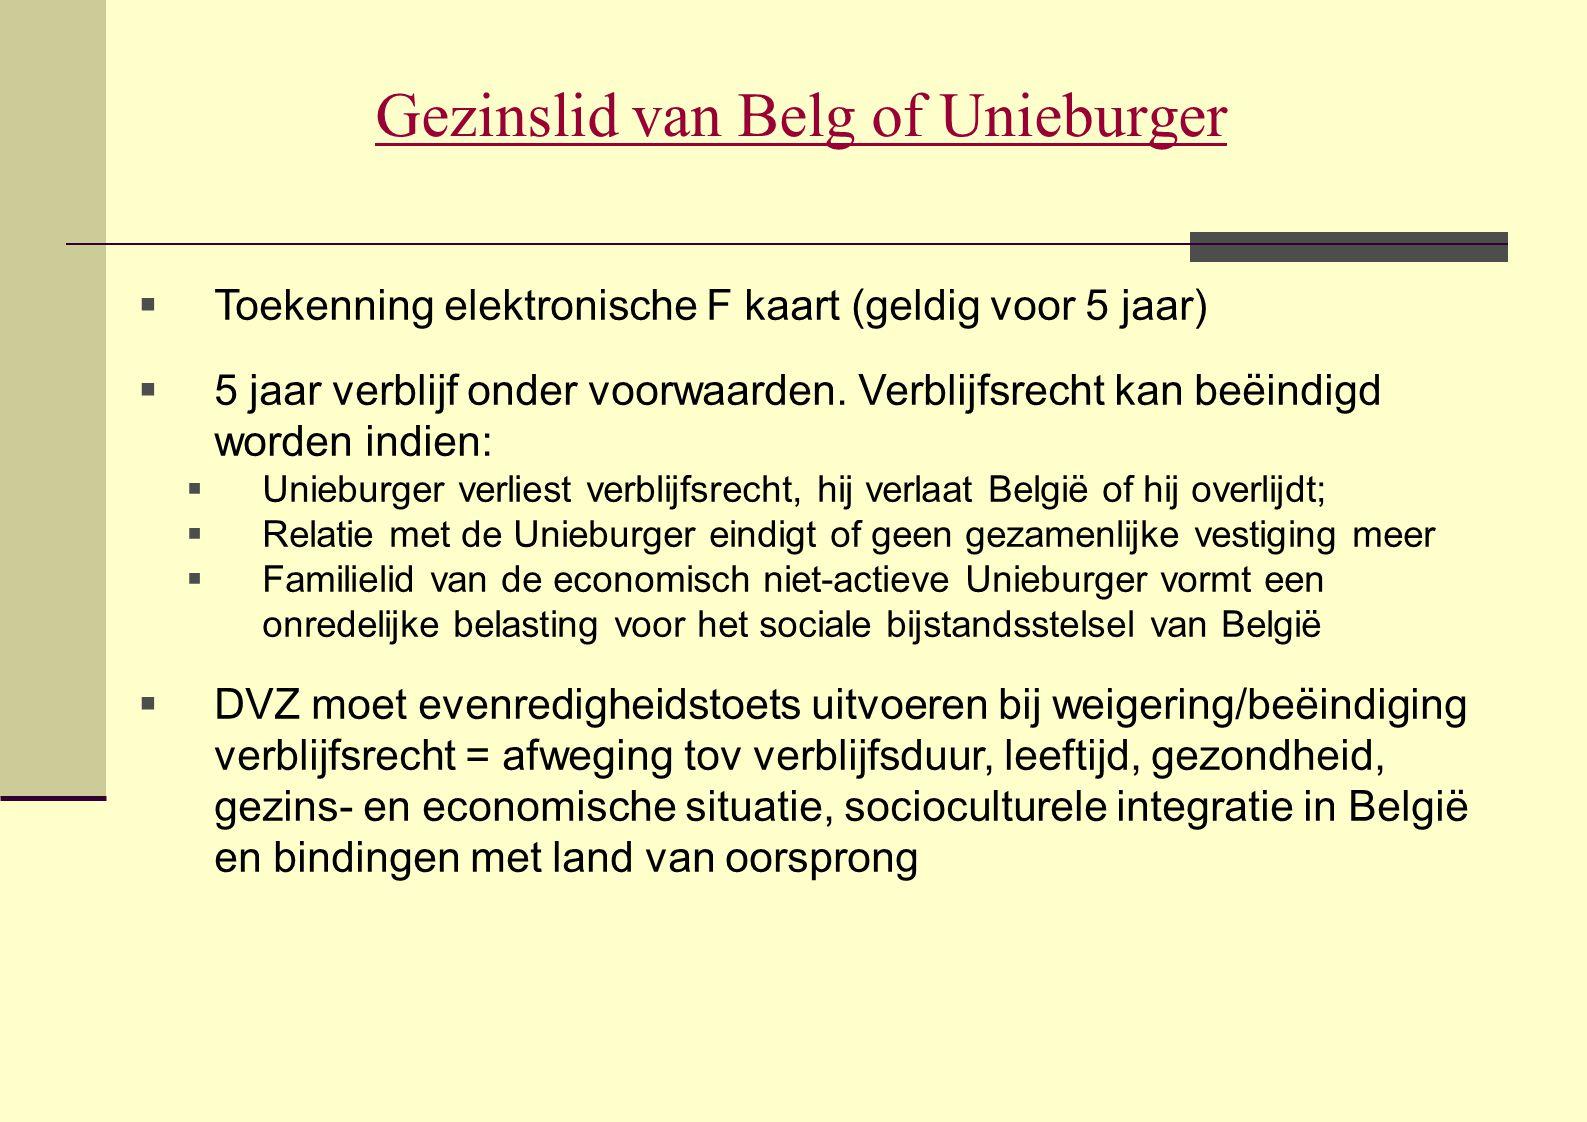 Gezinslid van Belg of Unieburger